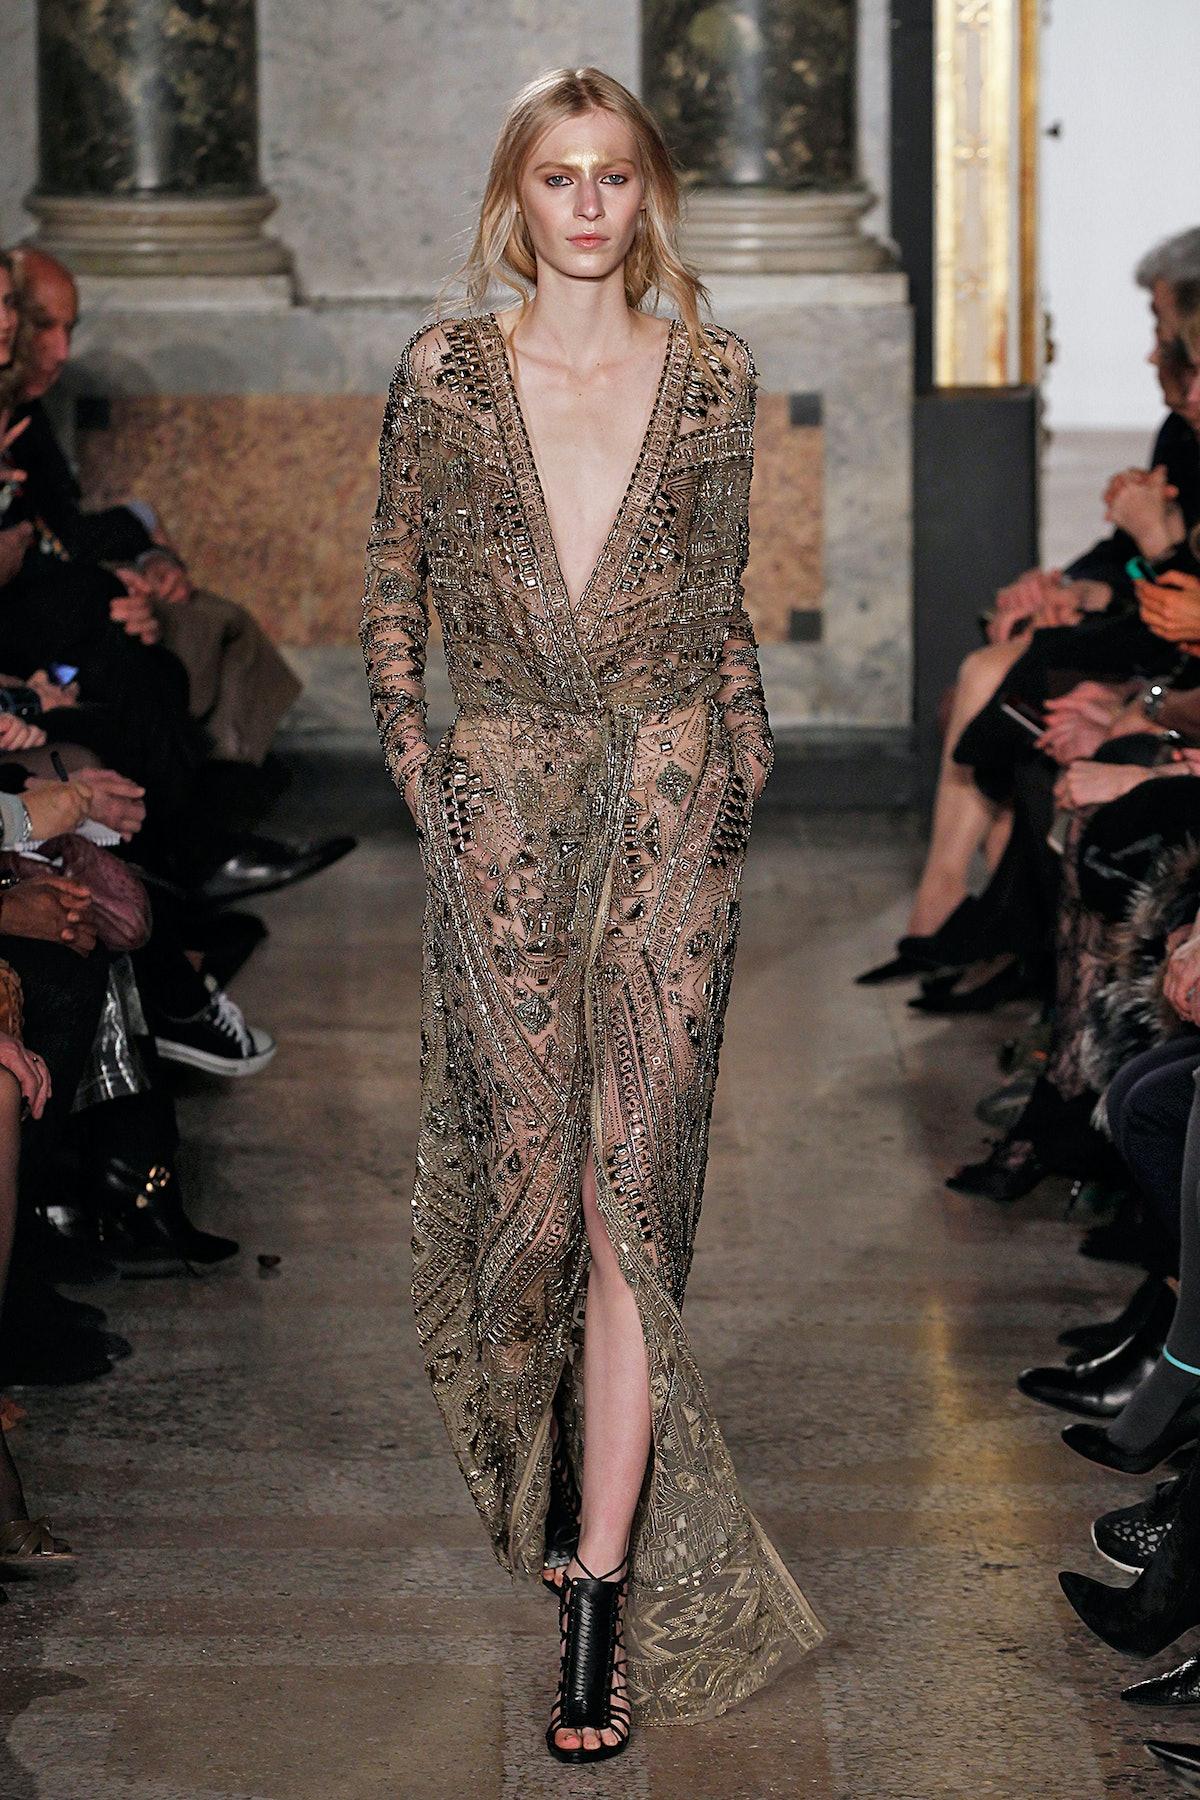 Emilio Pucci gown